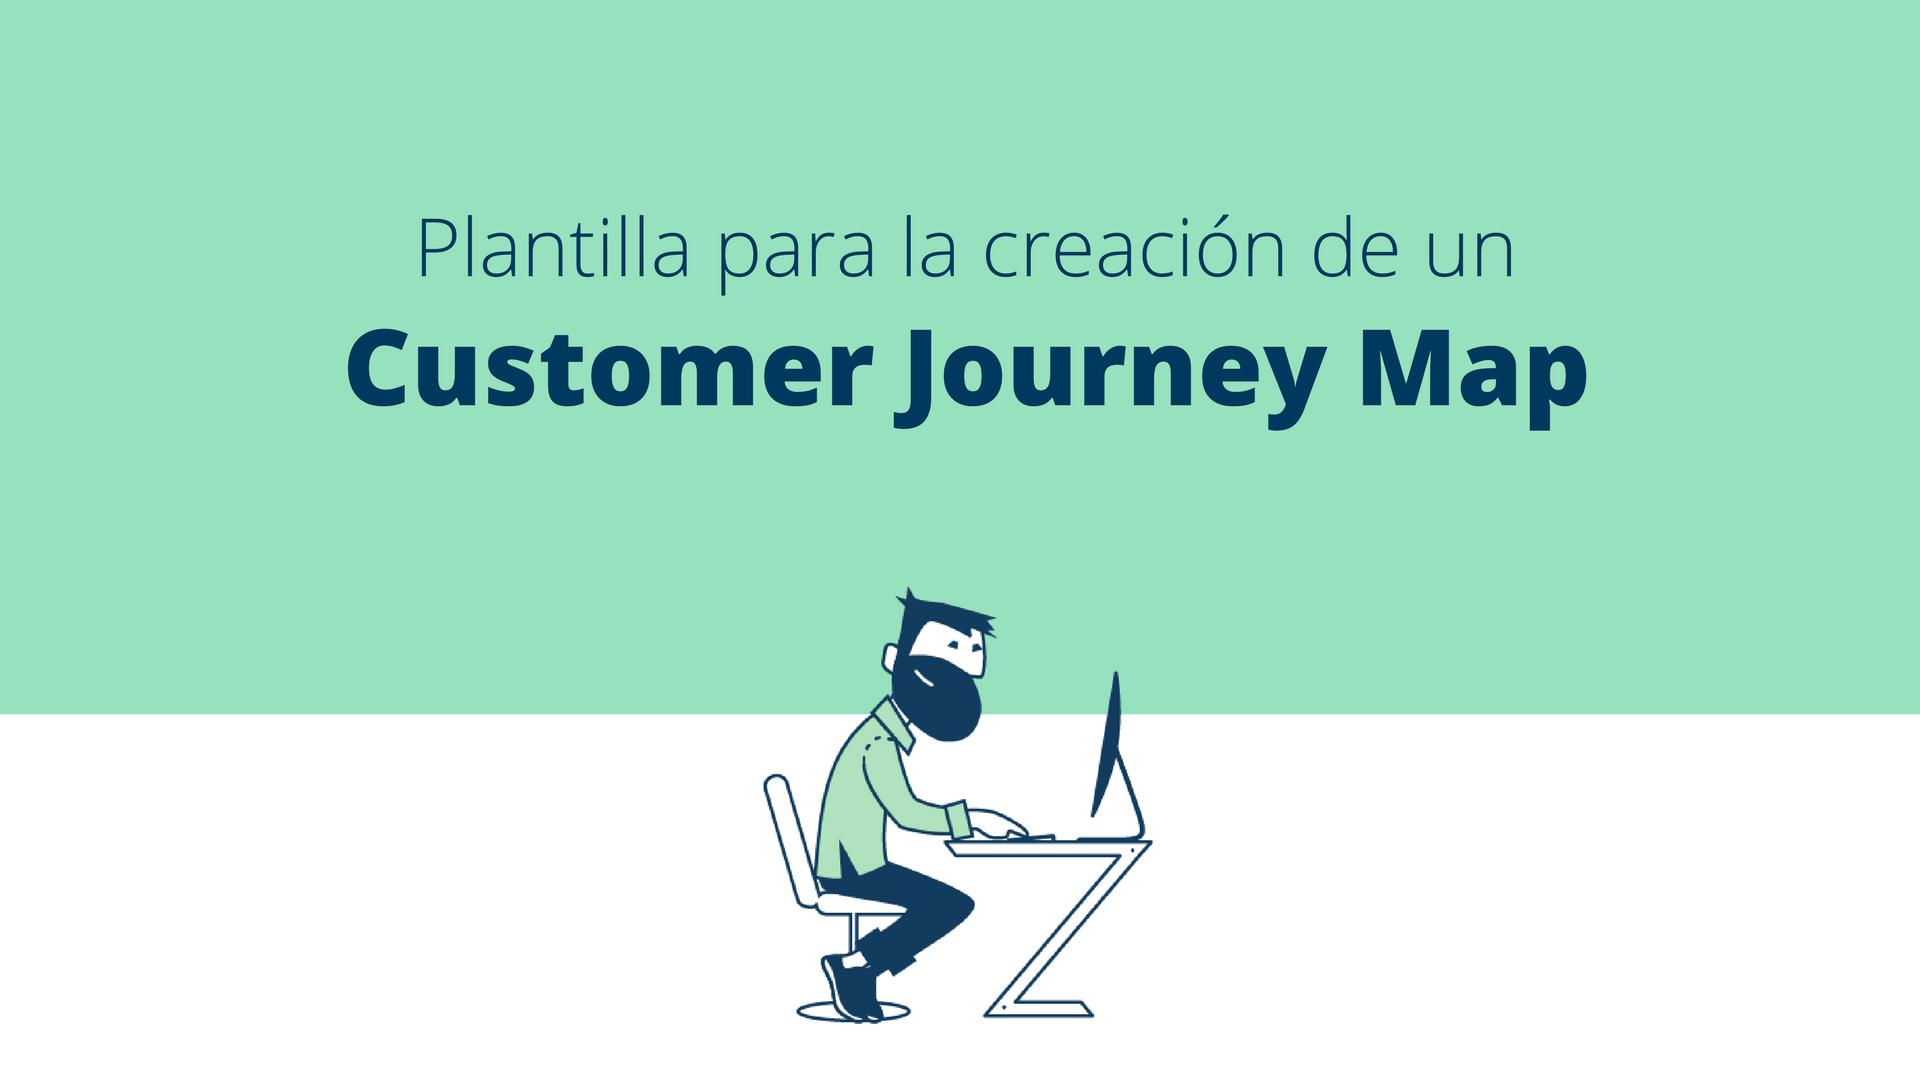 Plantilla de un Customer Journey map